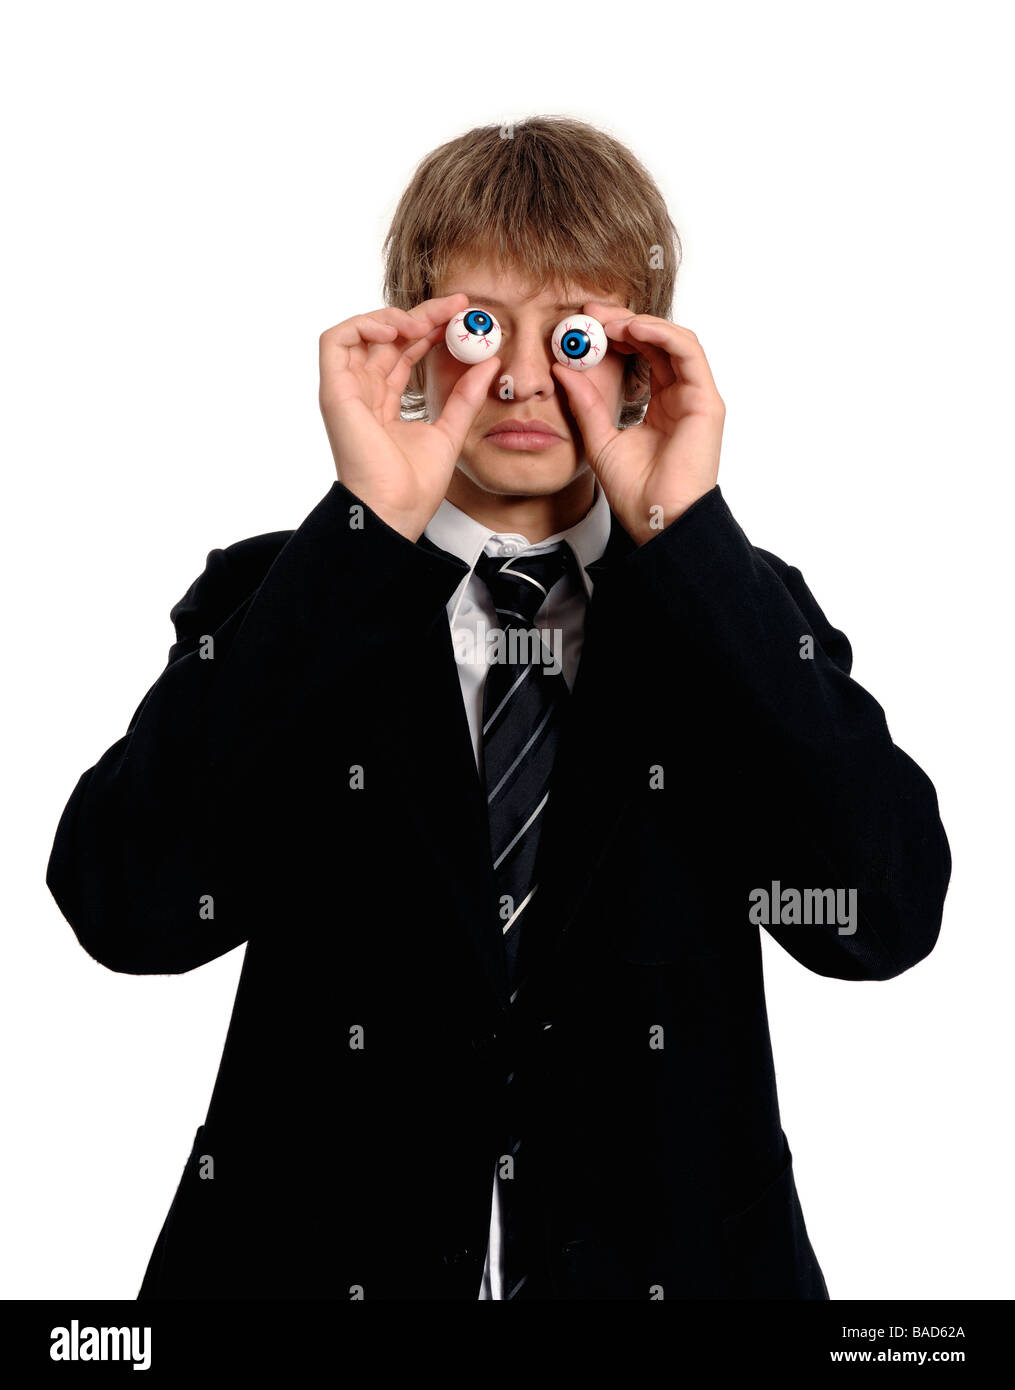 Schoolboy holding joke eyes - Stock Image